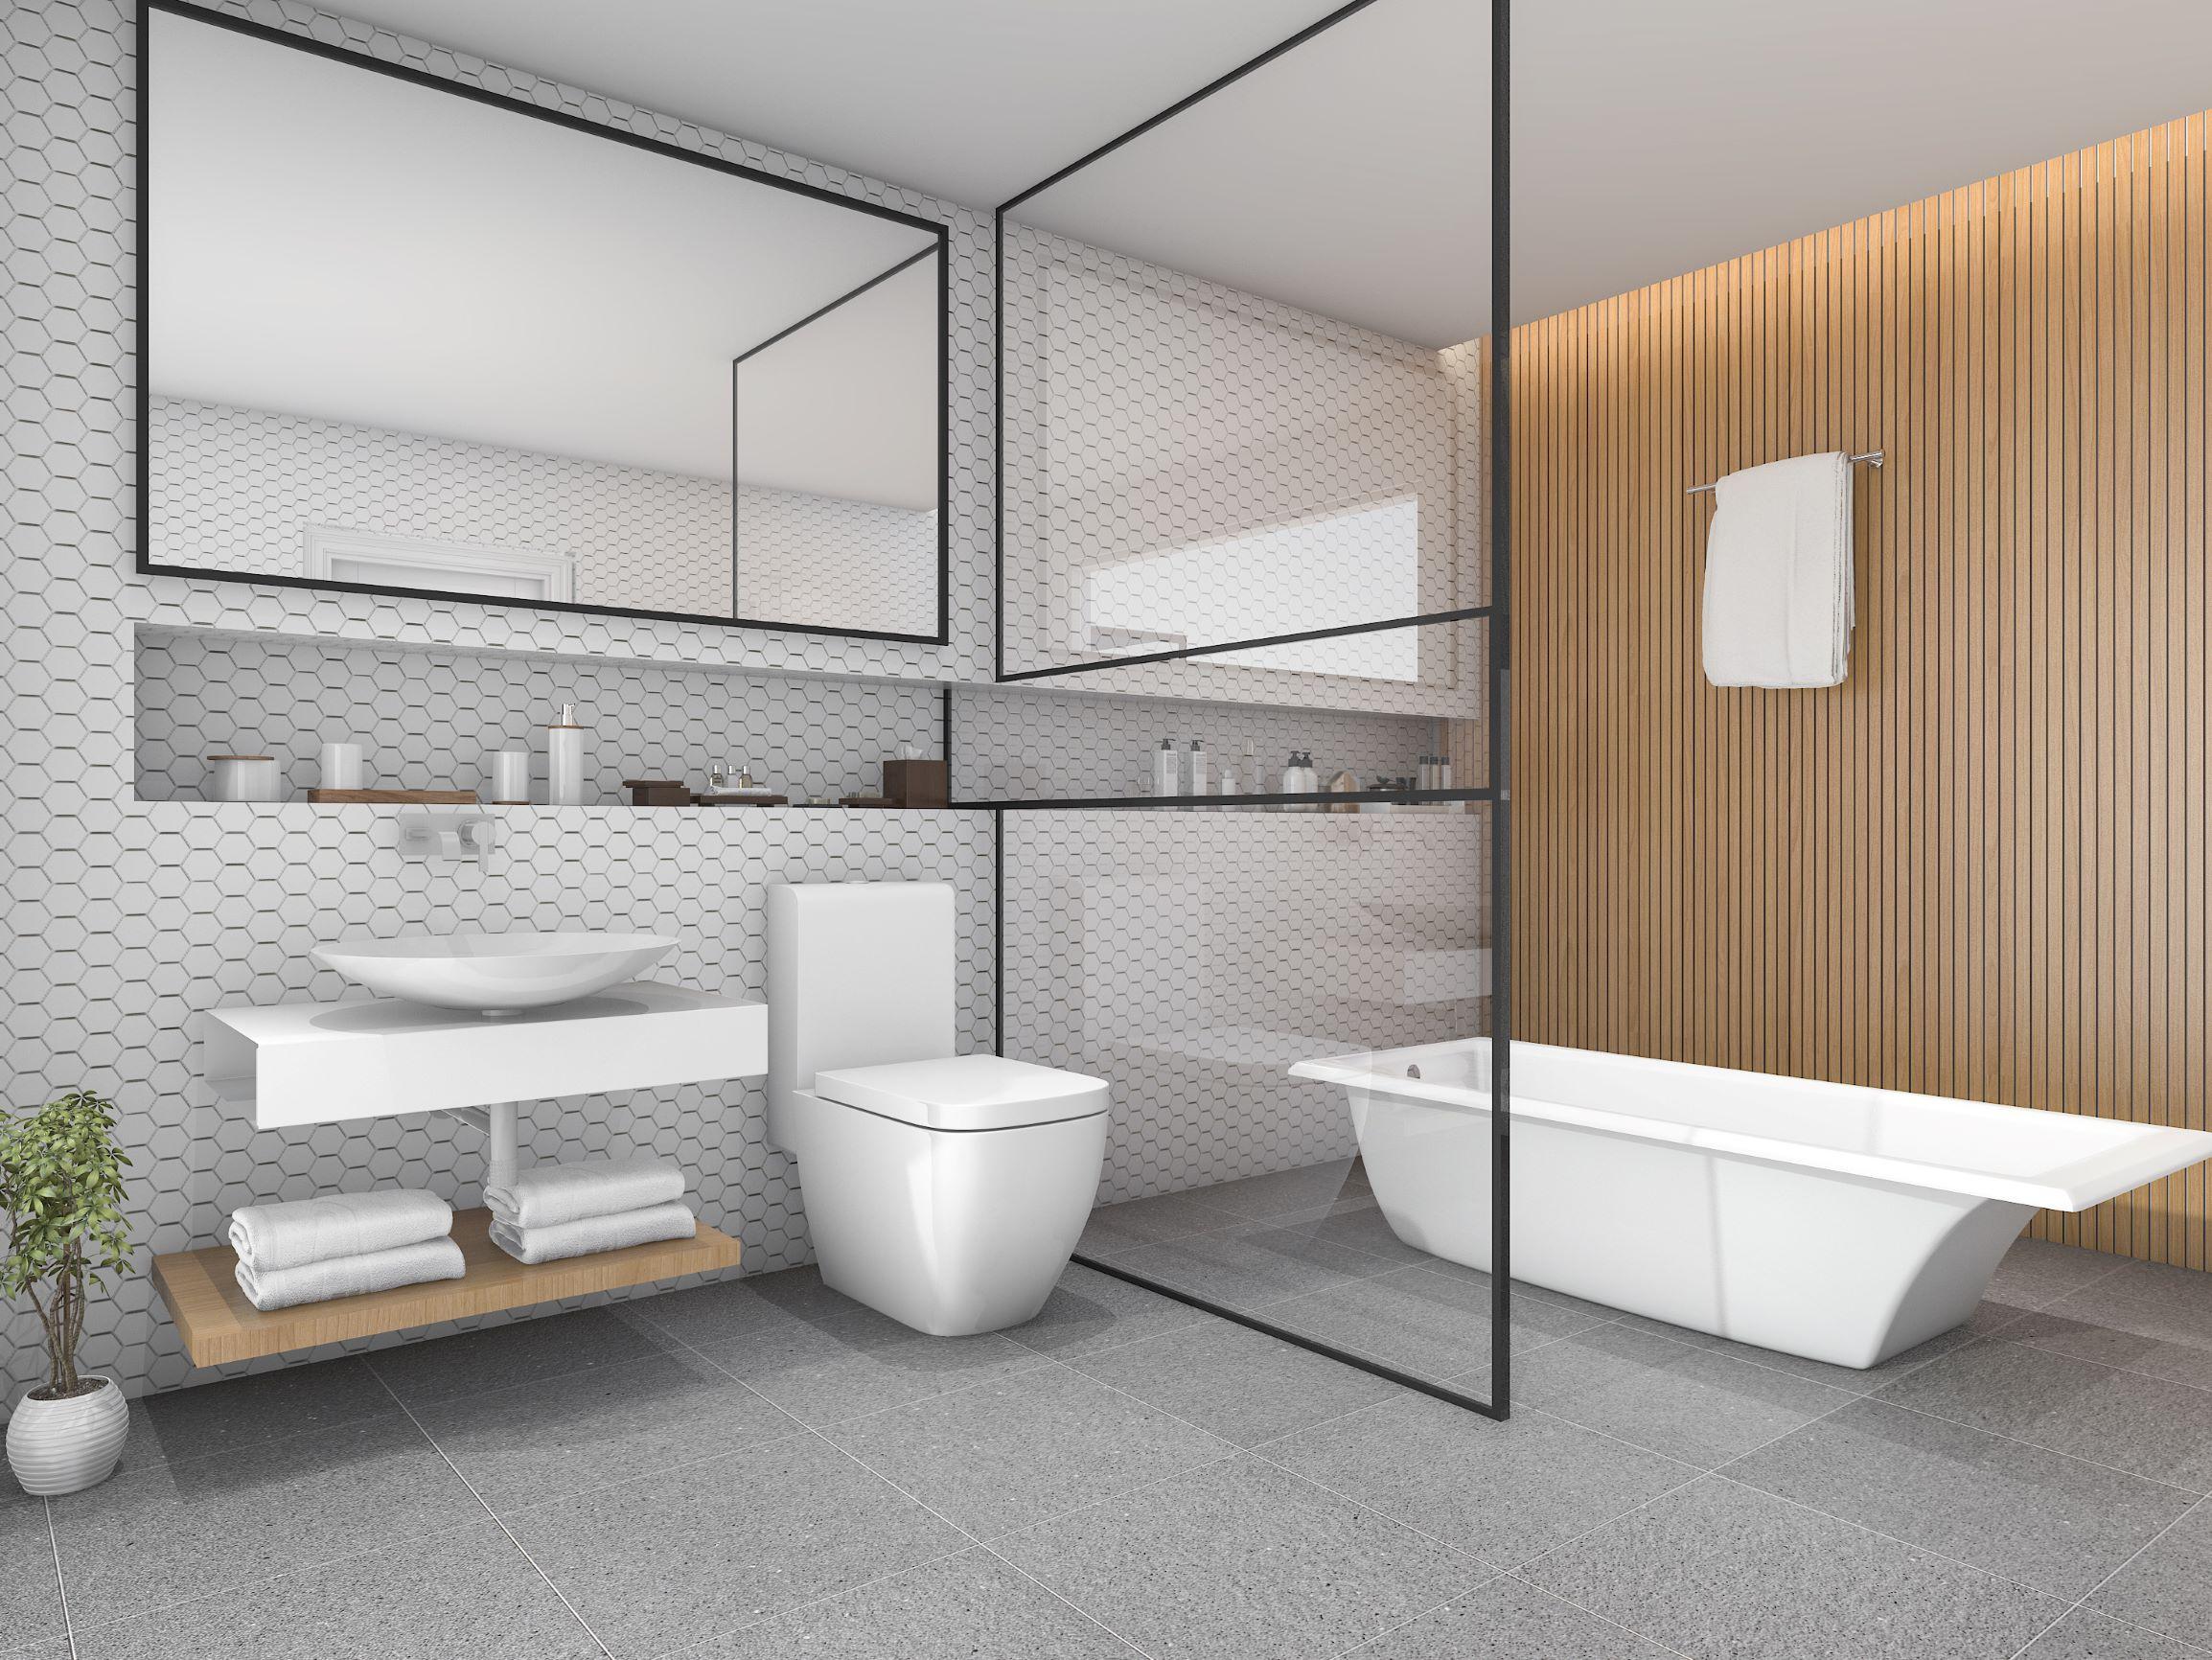 Bathroom Renovation Ideas Fascinating Shower Tile Designs Jkitchencabinets2you